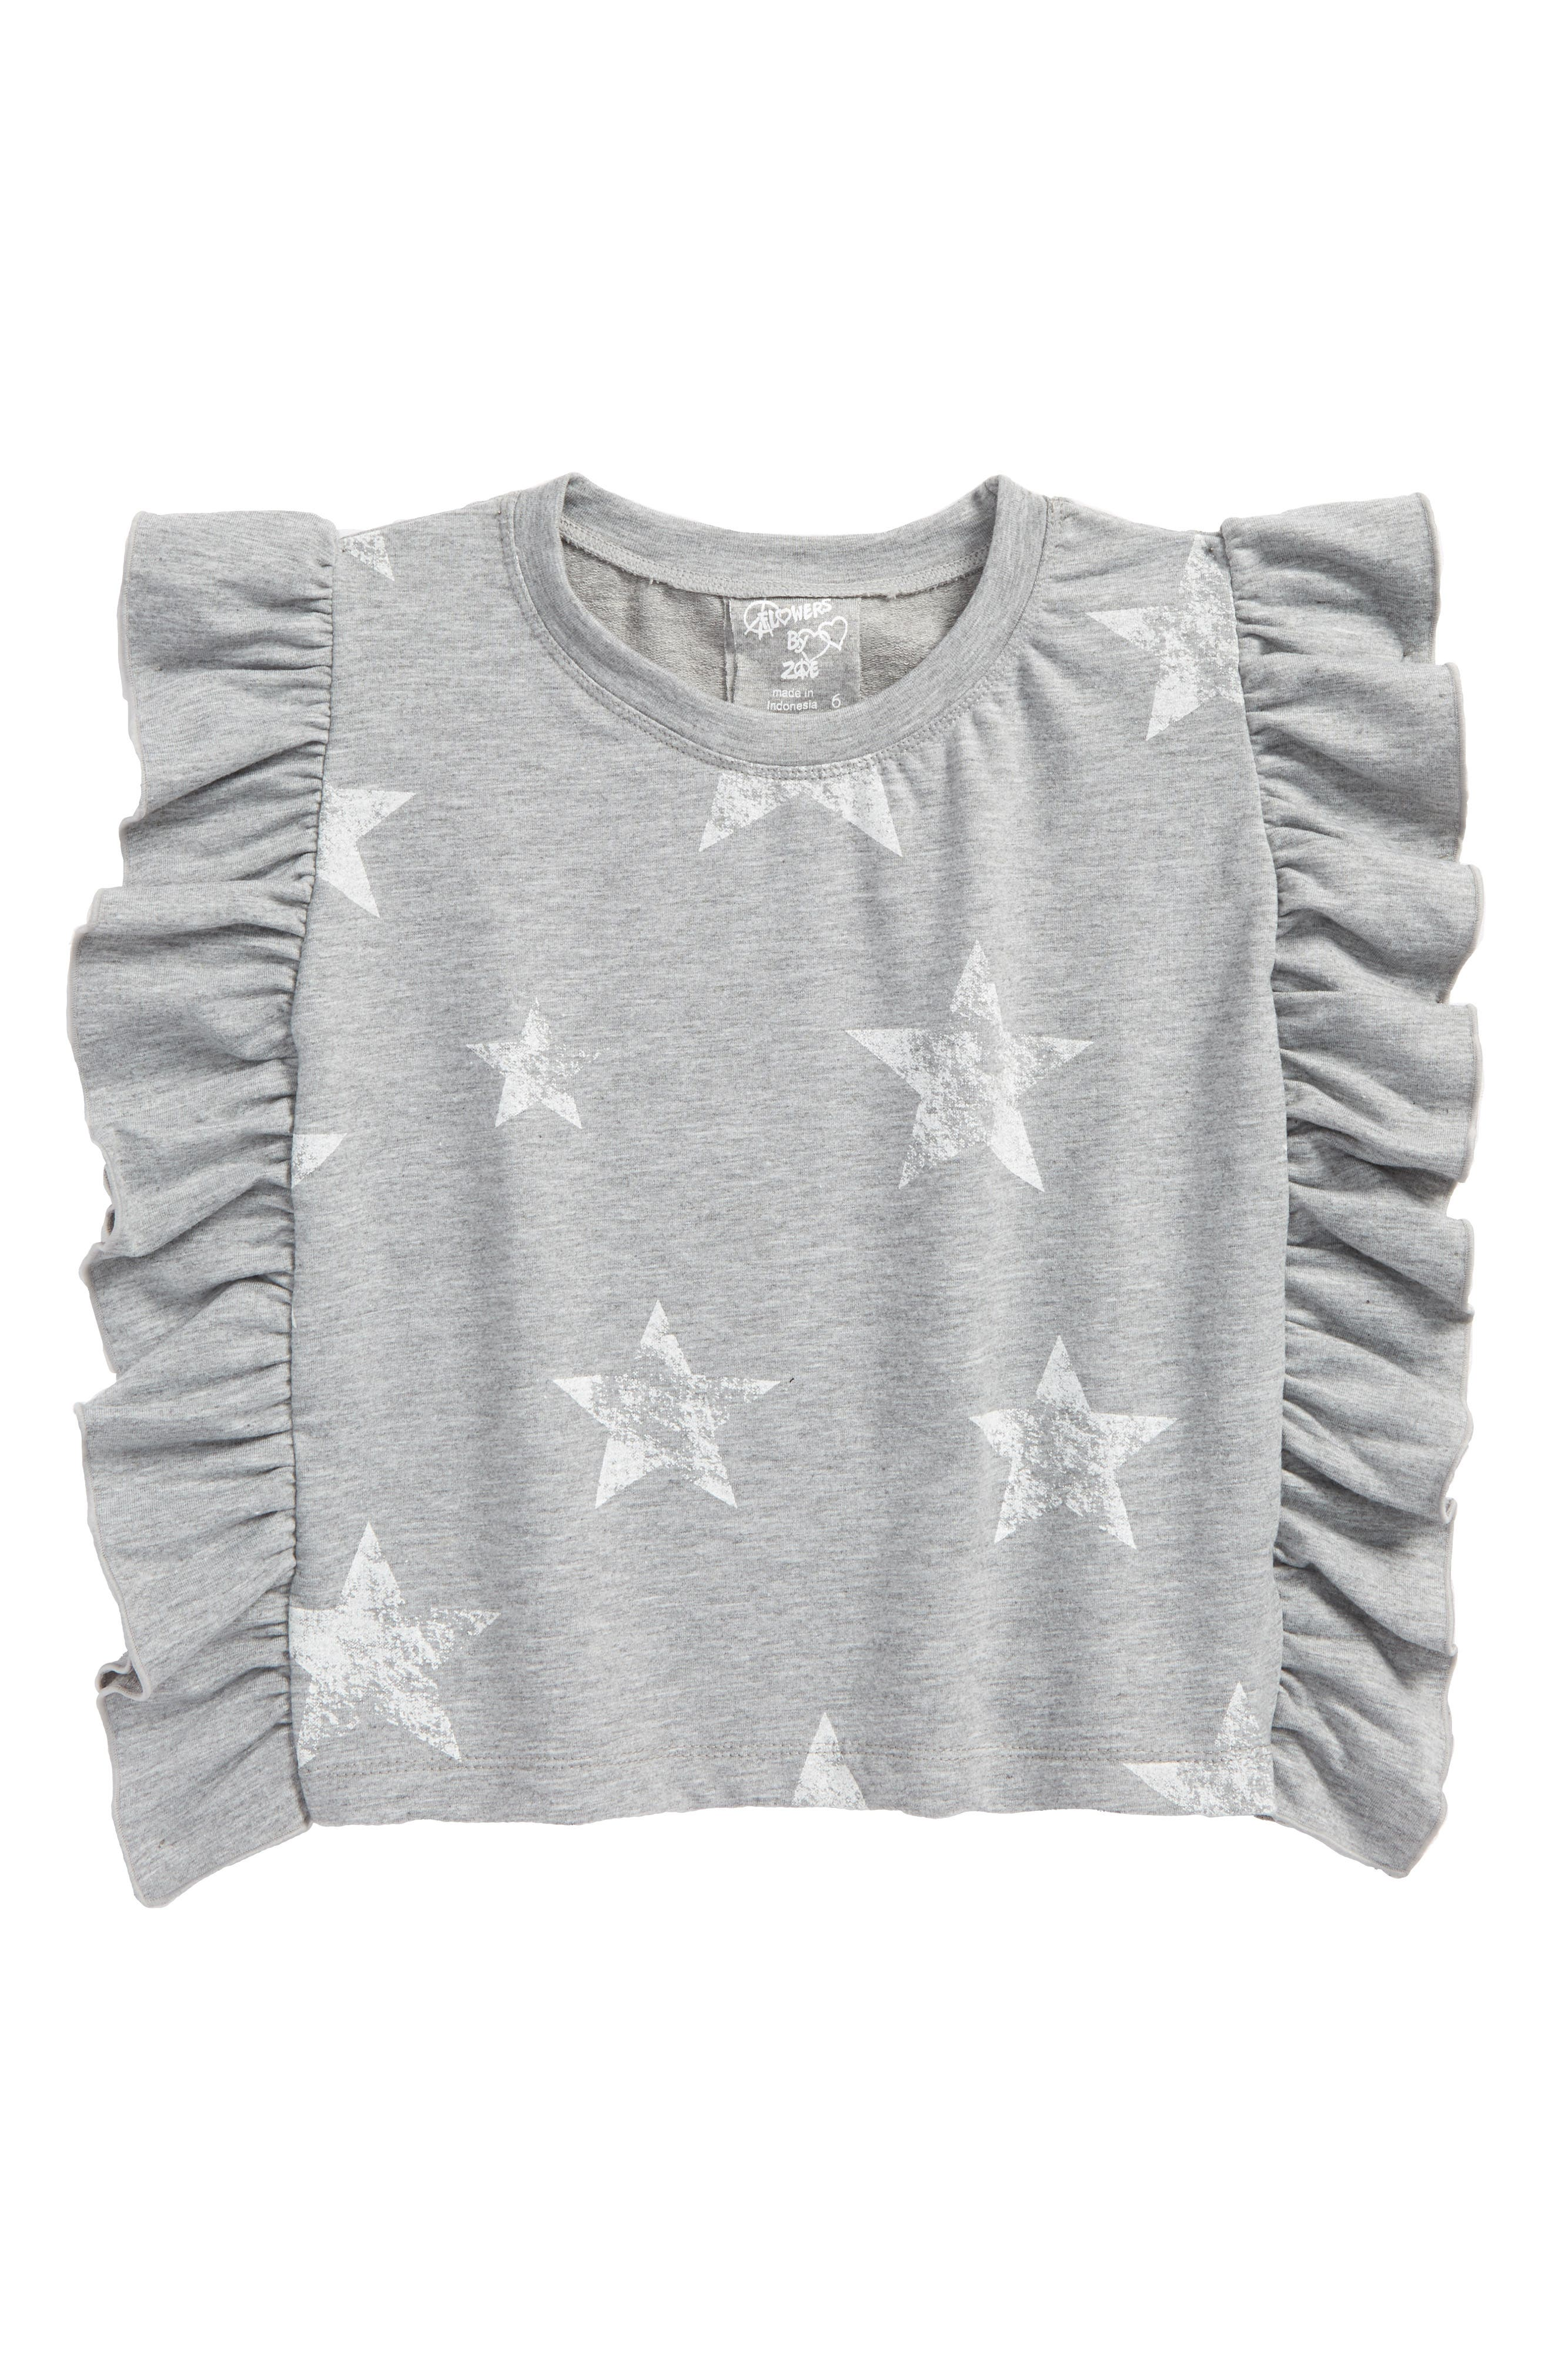 Main Image - Flowers by Zoe Star Print Ruffle Side Sweatshirt (Big Girls)